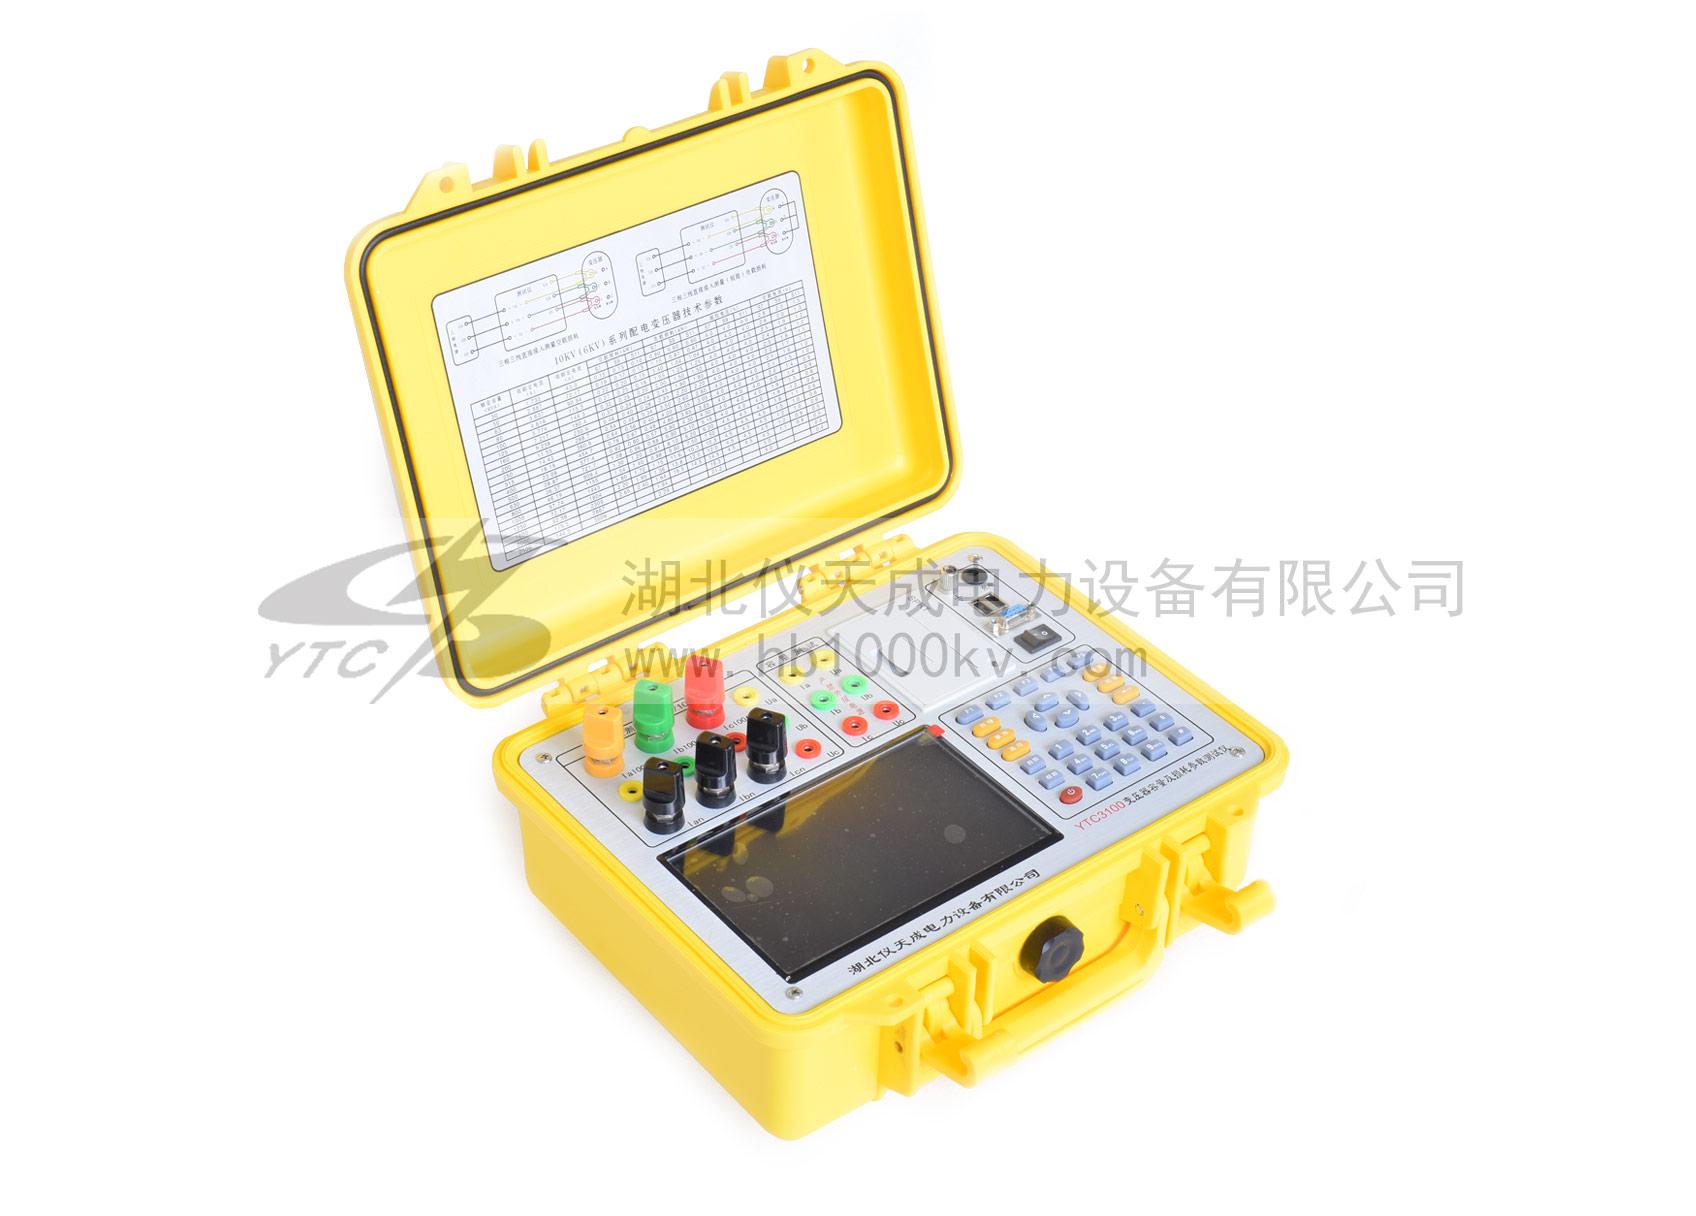 YTC3100变压器rongliang及损hao参数测shi仪主机